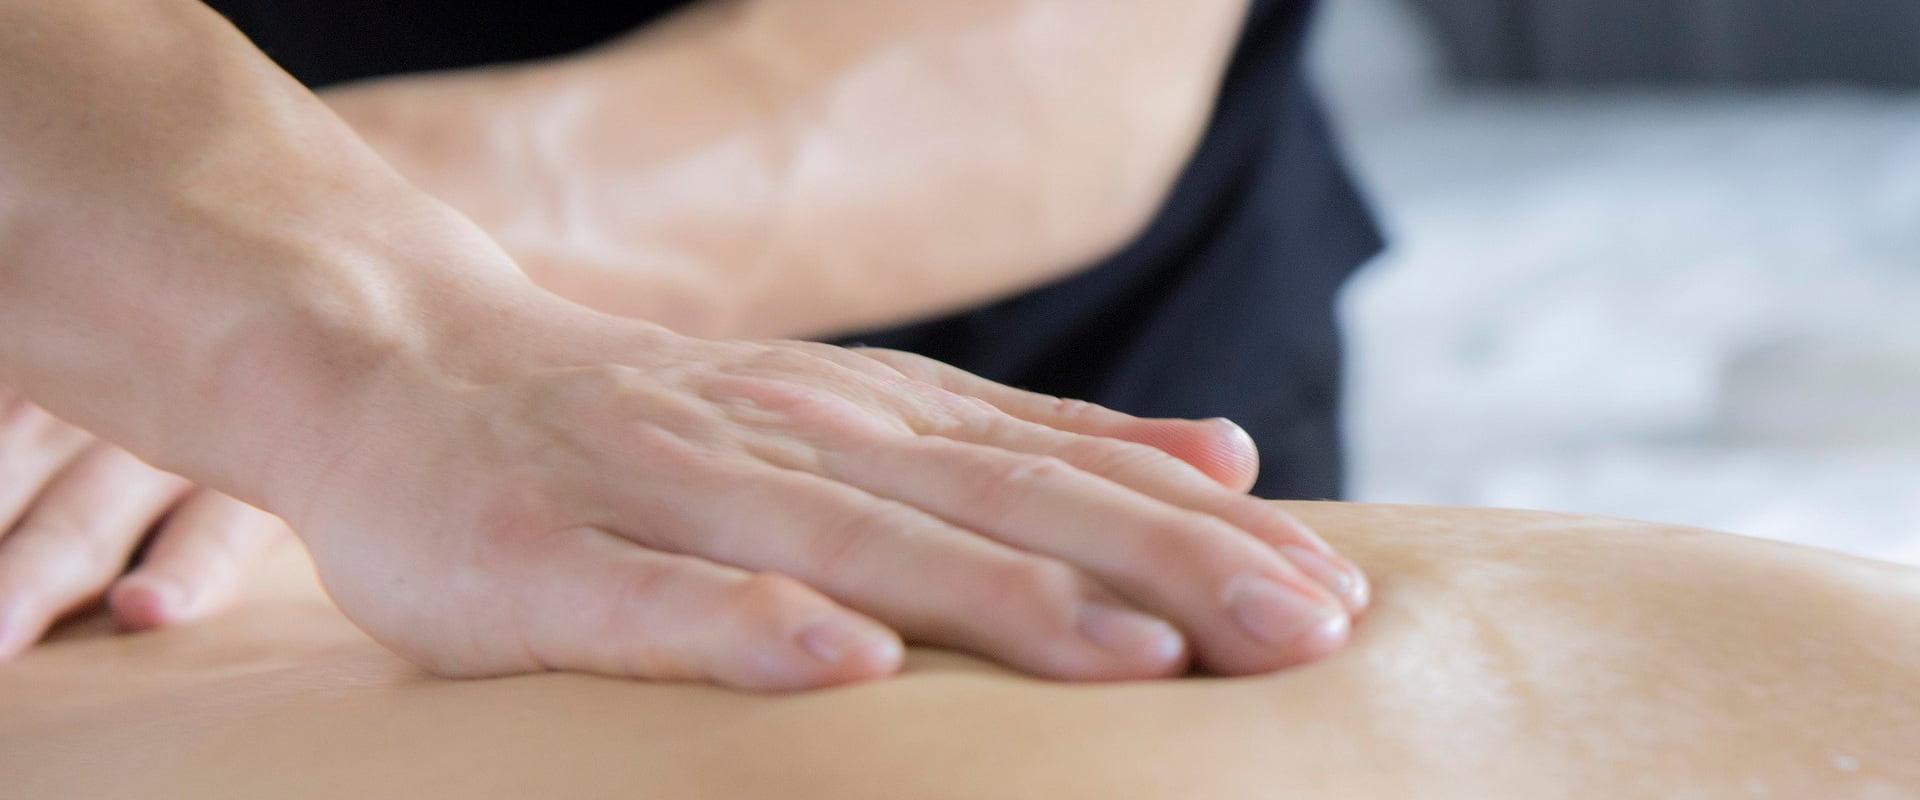 masaje tántrico para mujeres